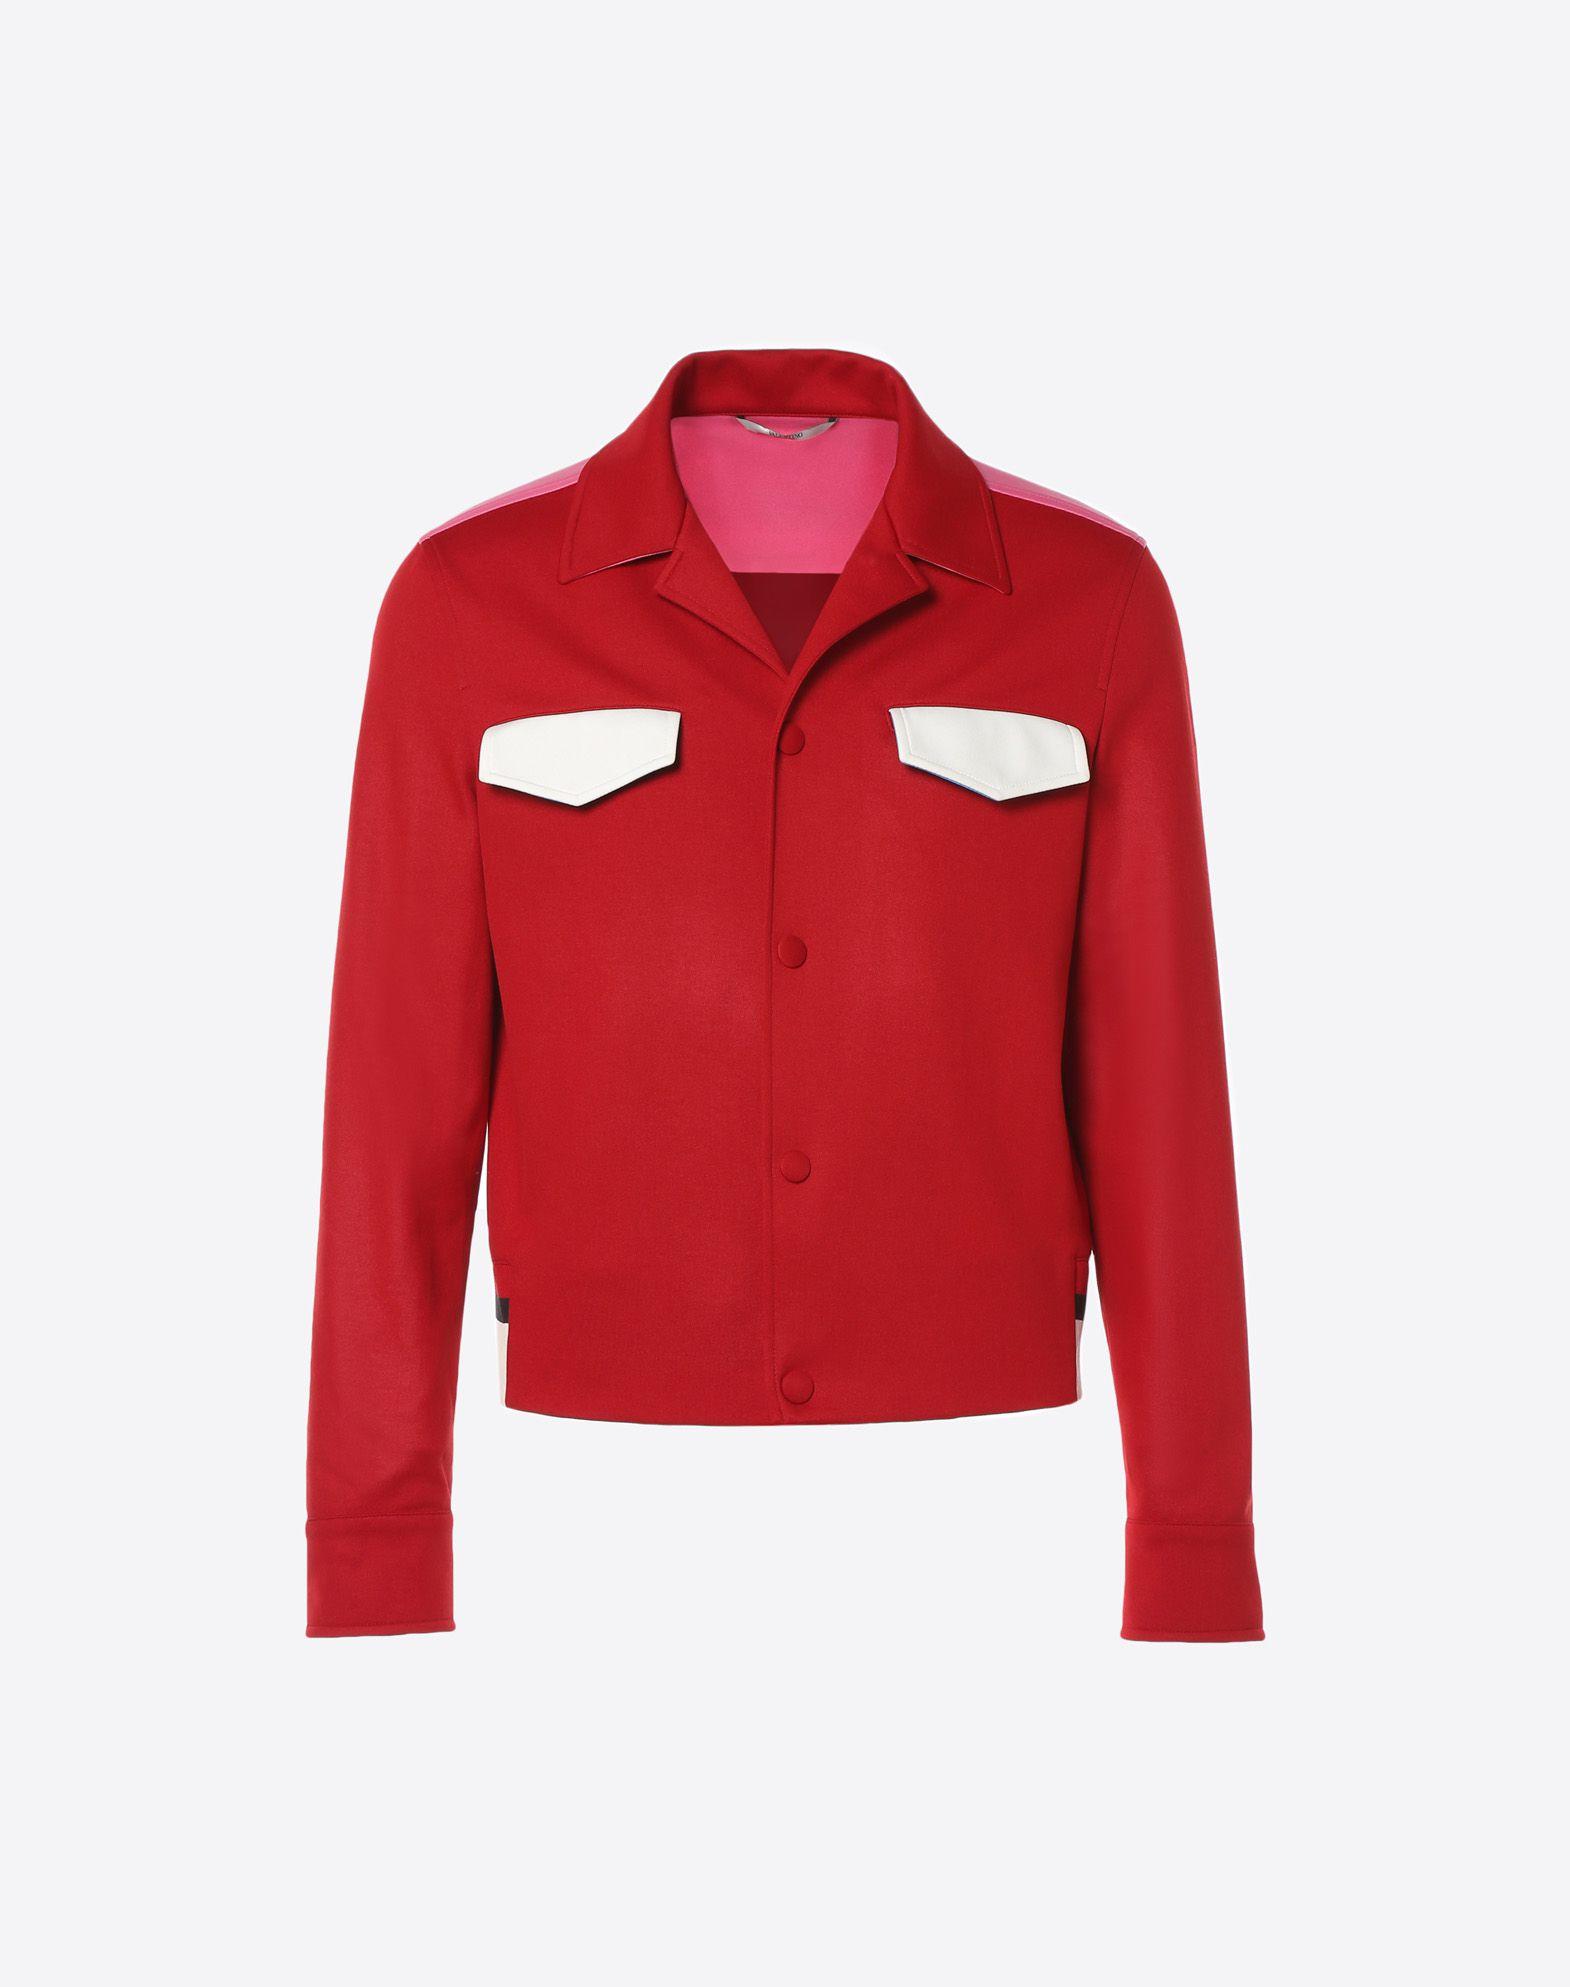 valentino men u0027s clothing t shirts sweaters jackets valentino